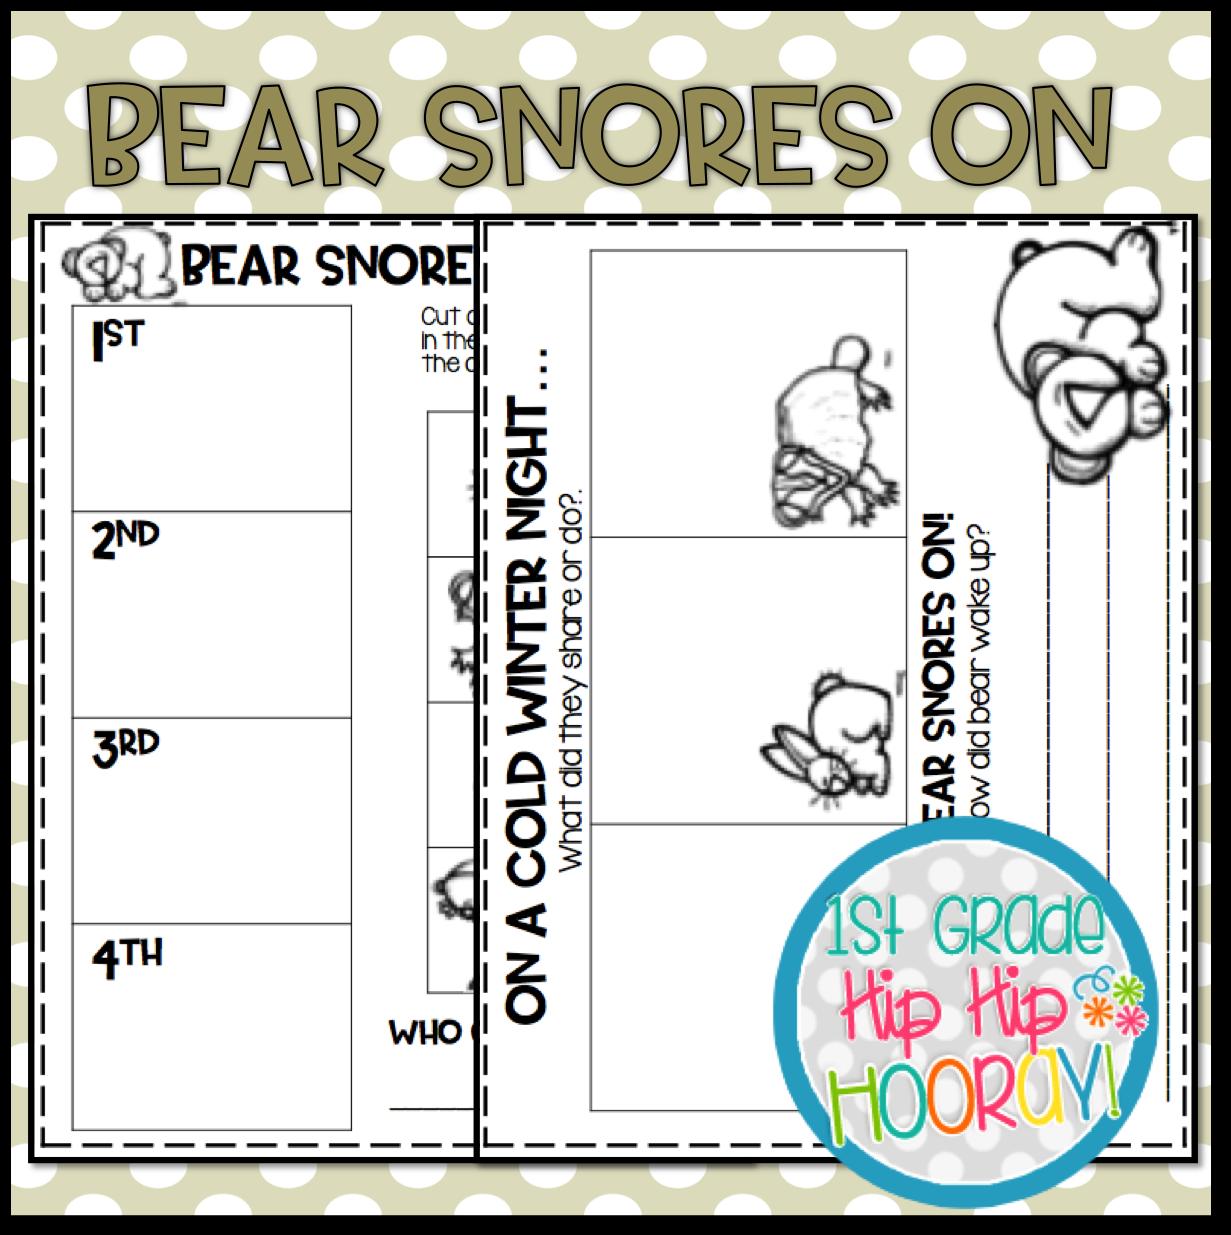 1st Grade Hip Hip Hooray Bear Snores On Eebie